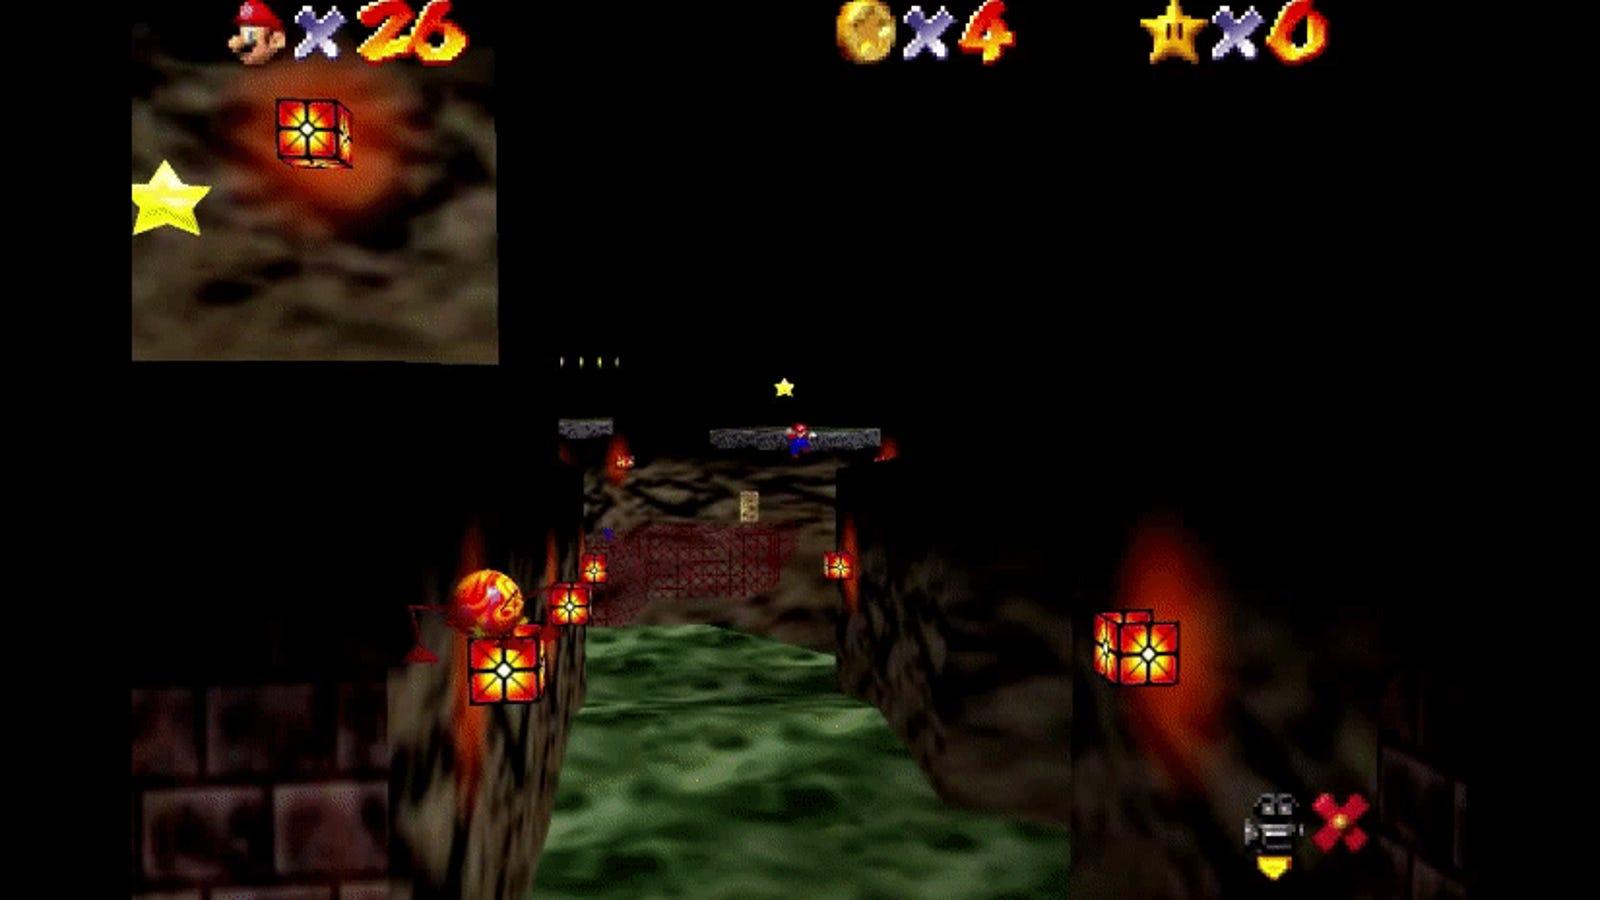 Famous Super Mario 64 Trick Involving Parallel Universes